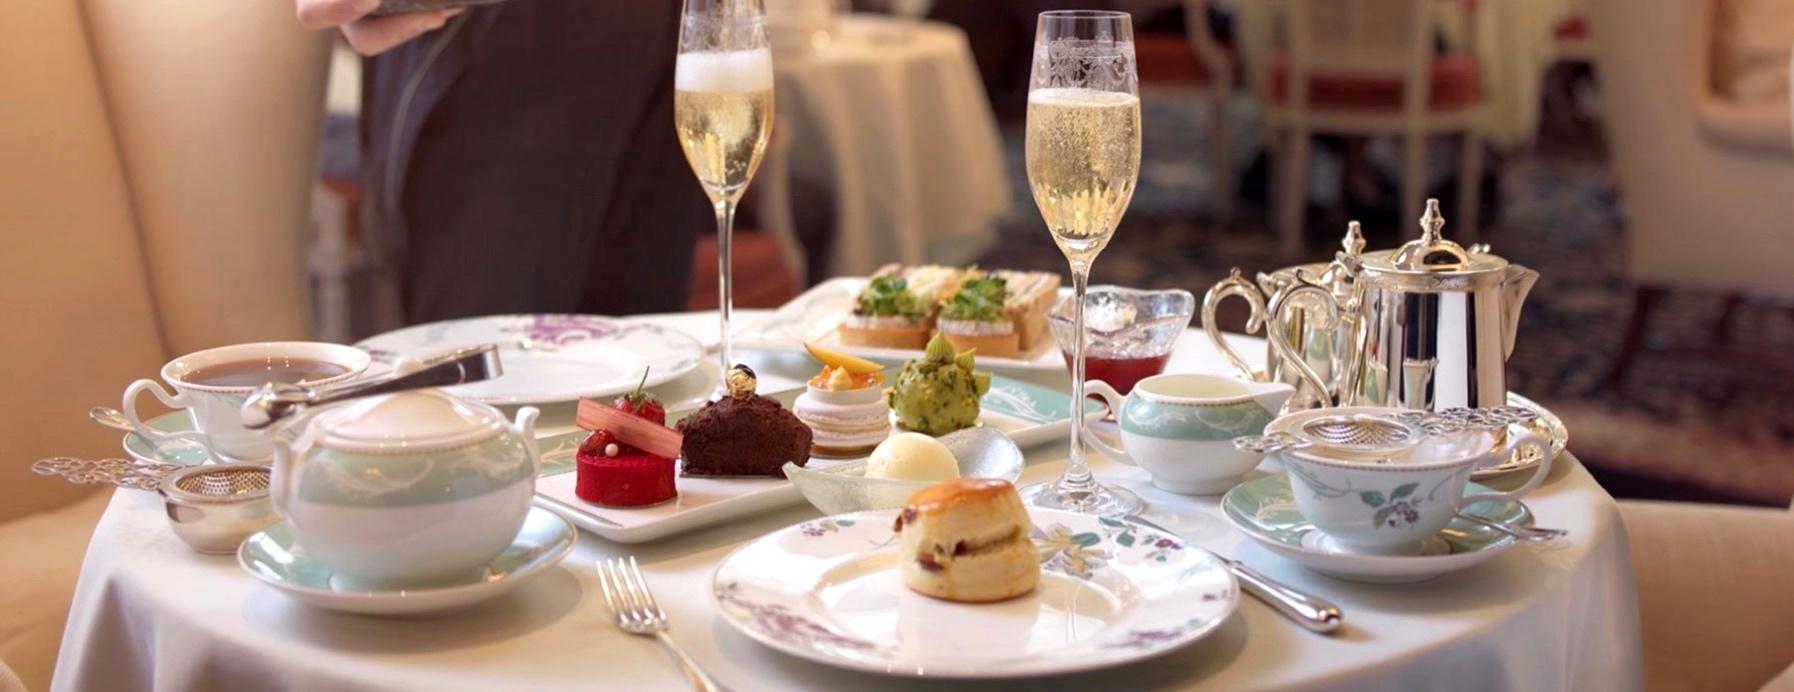 Afternoon Tea Etiquette -